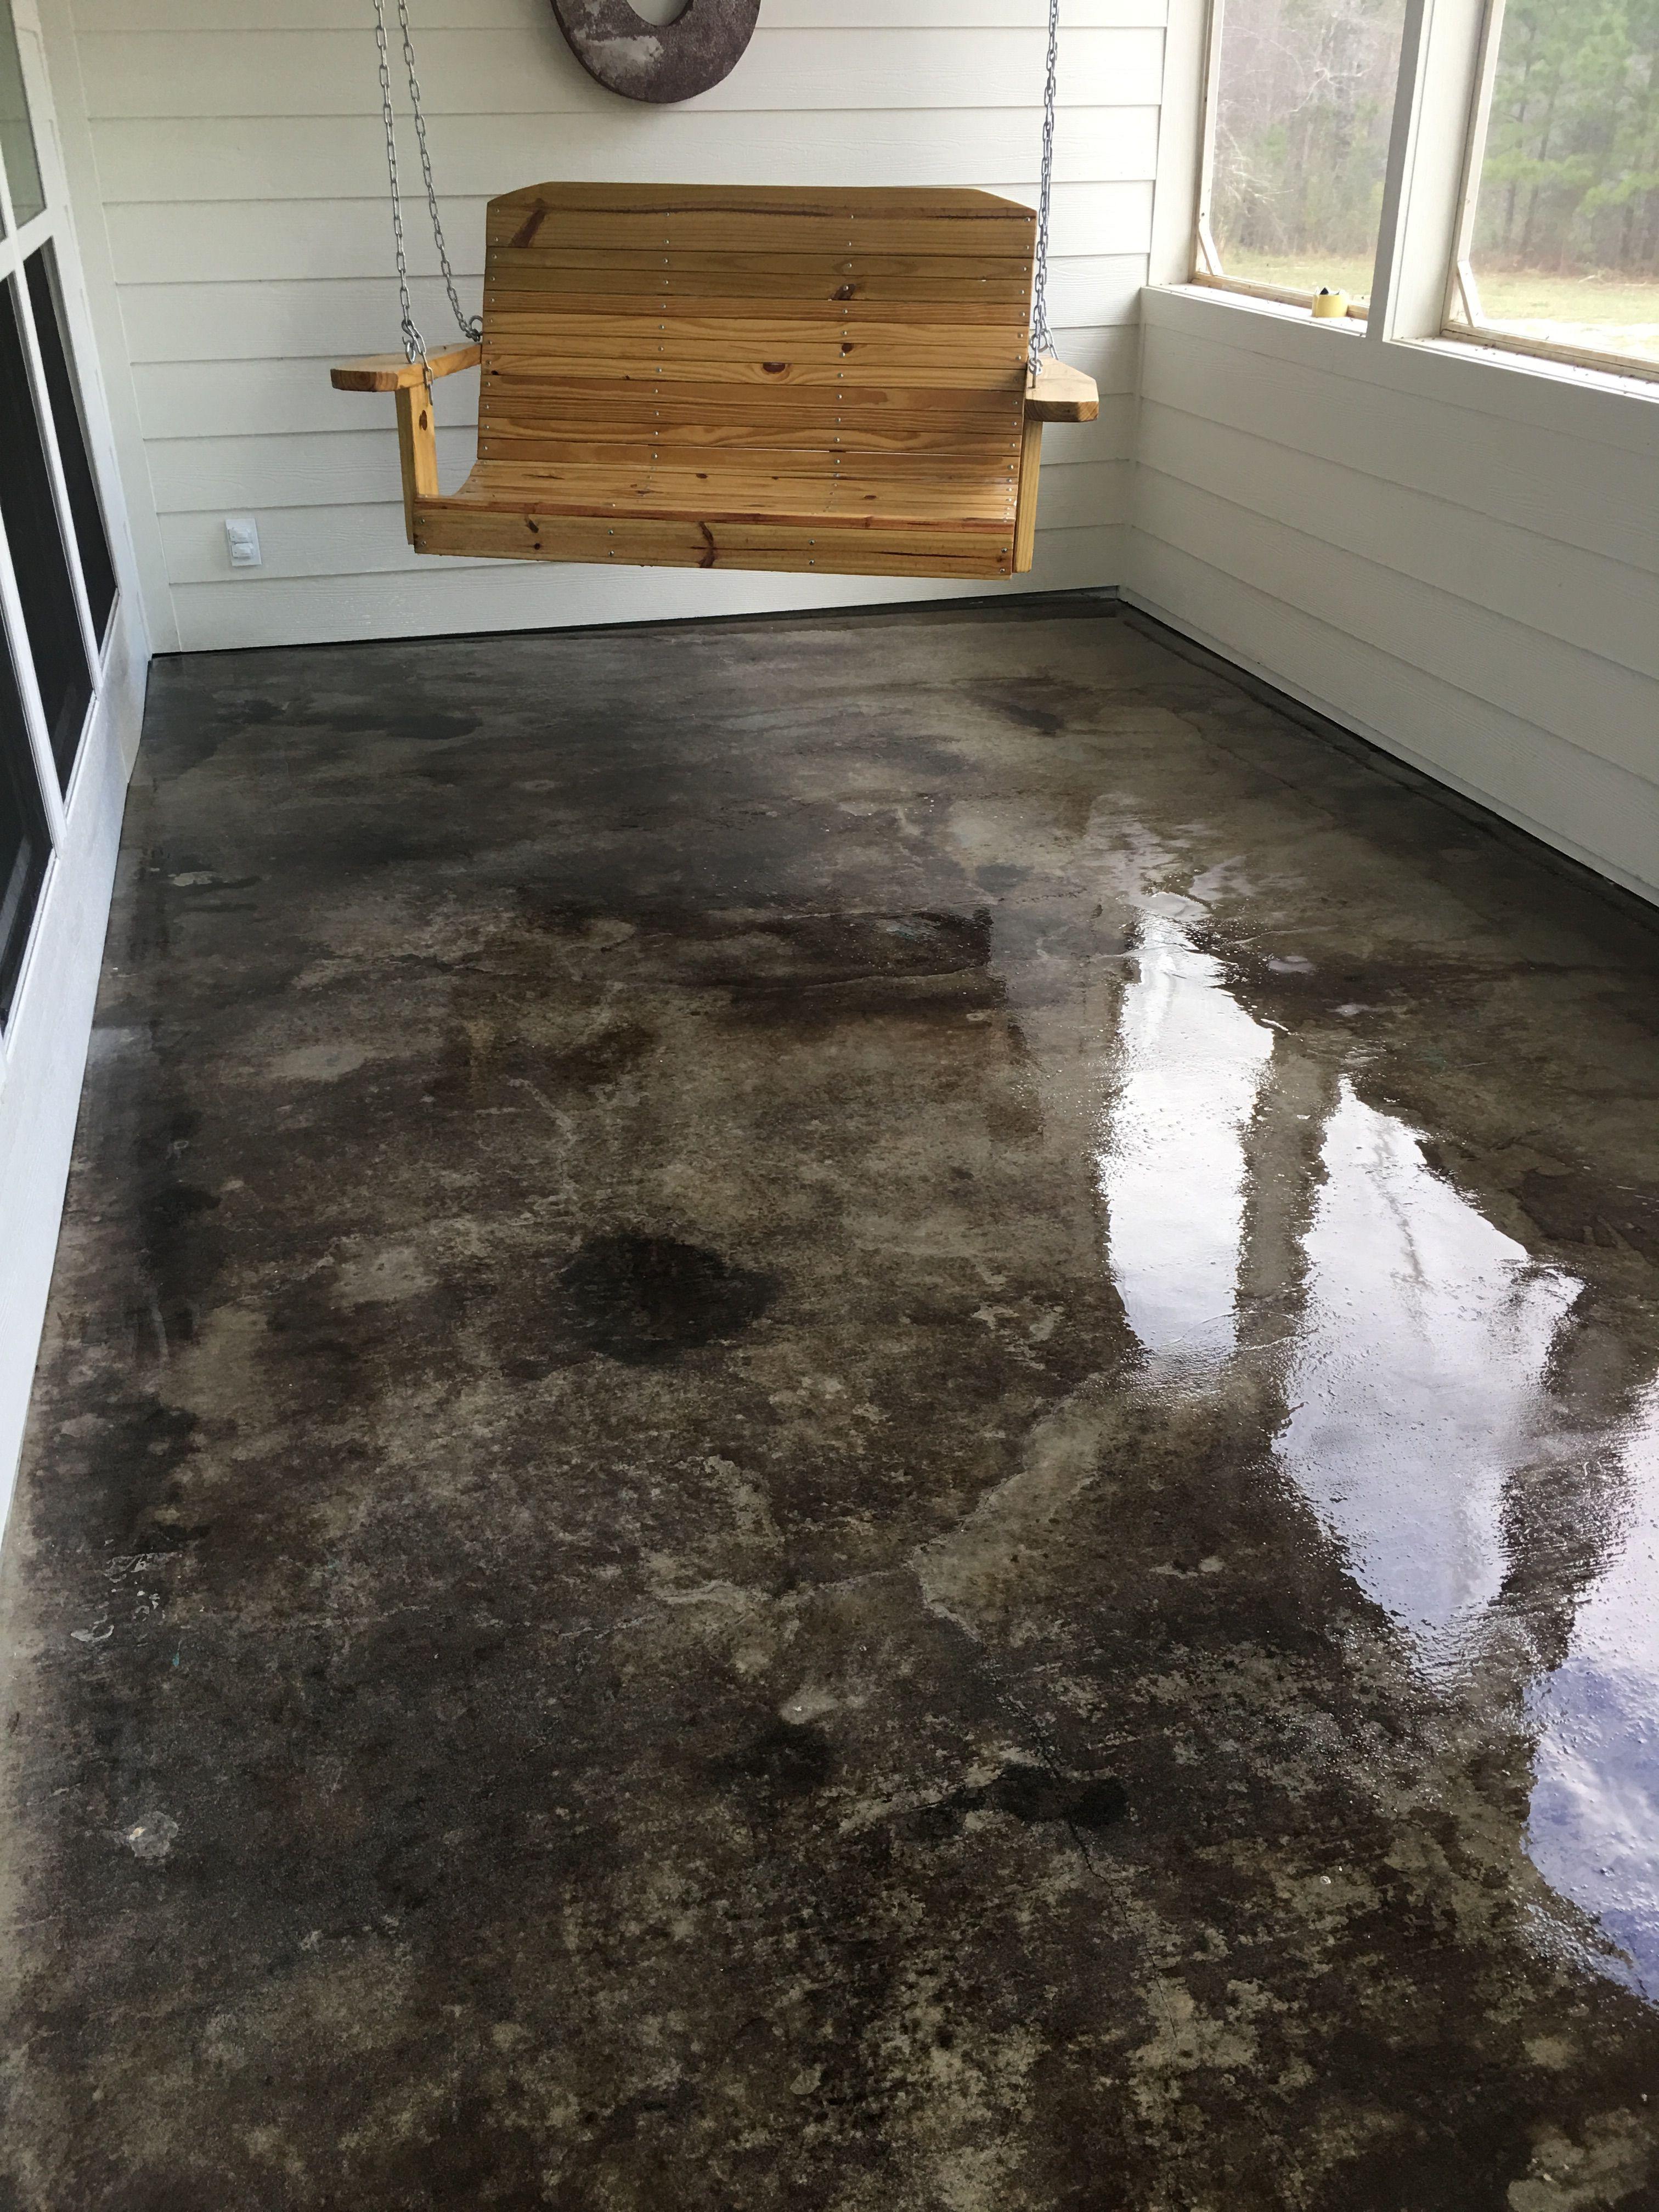 hardwood floor on cement slab of gray acid stained concrete porch basement floor pinterest inside gray acid stained concrete porch porch flooring diy flooring basement flooring basement remodeling